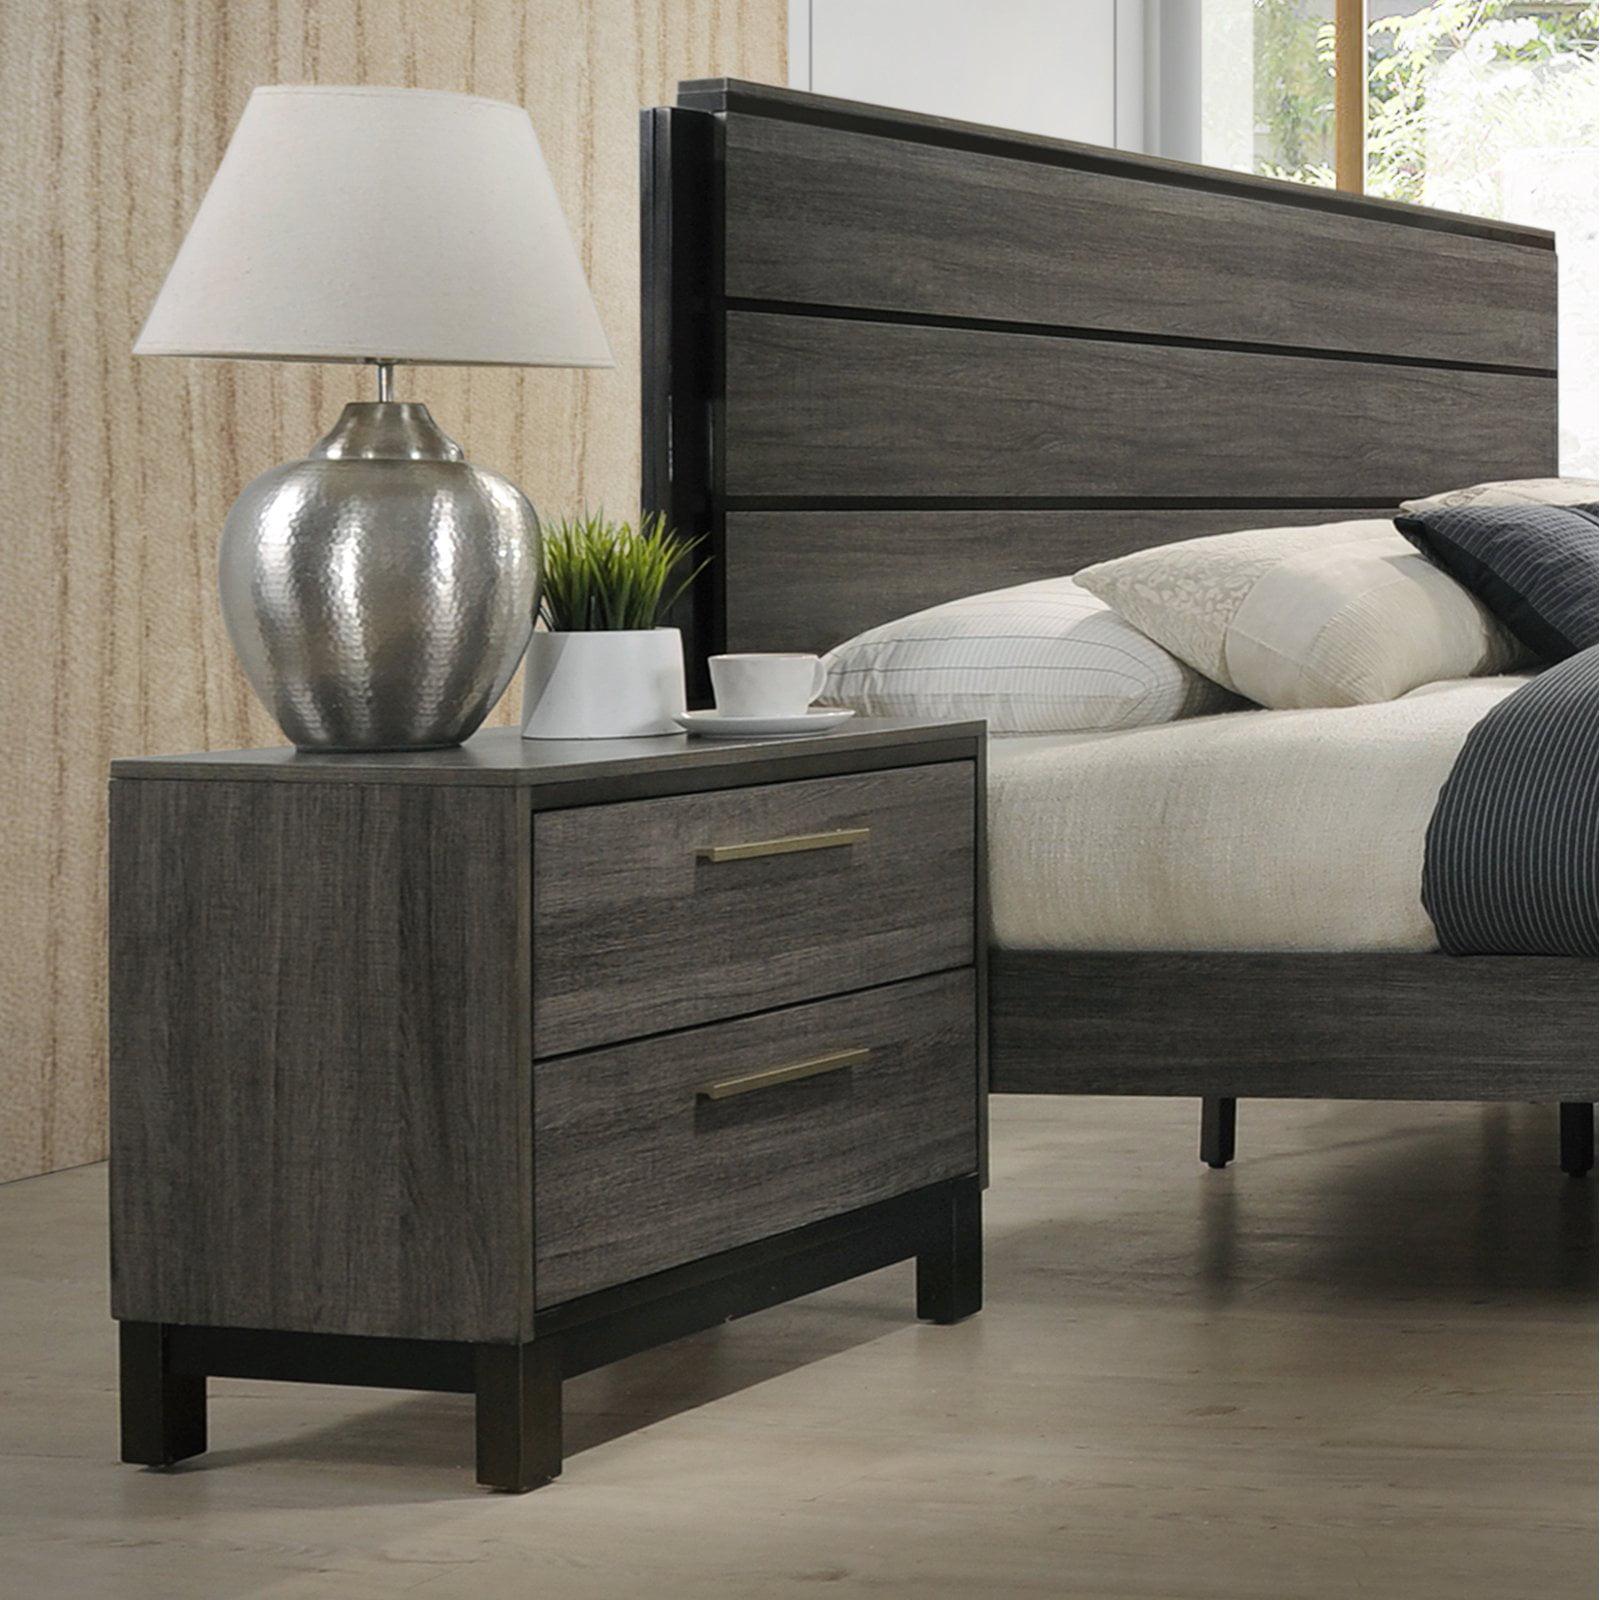 Antique Grey Roundhill Furniture B187N Loana Wood 2-Drawer Nightstand